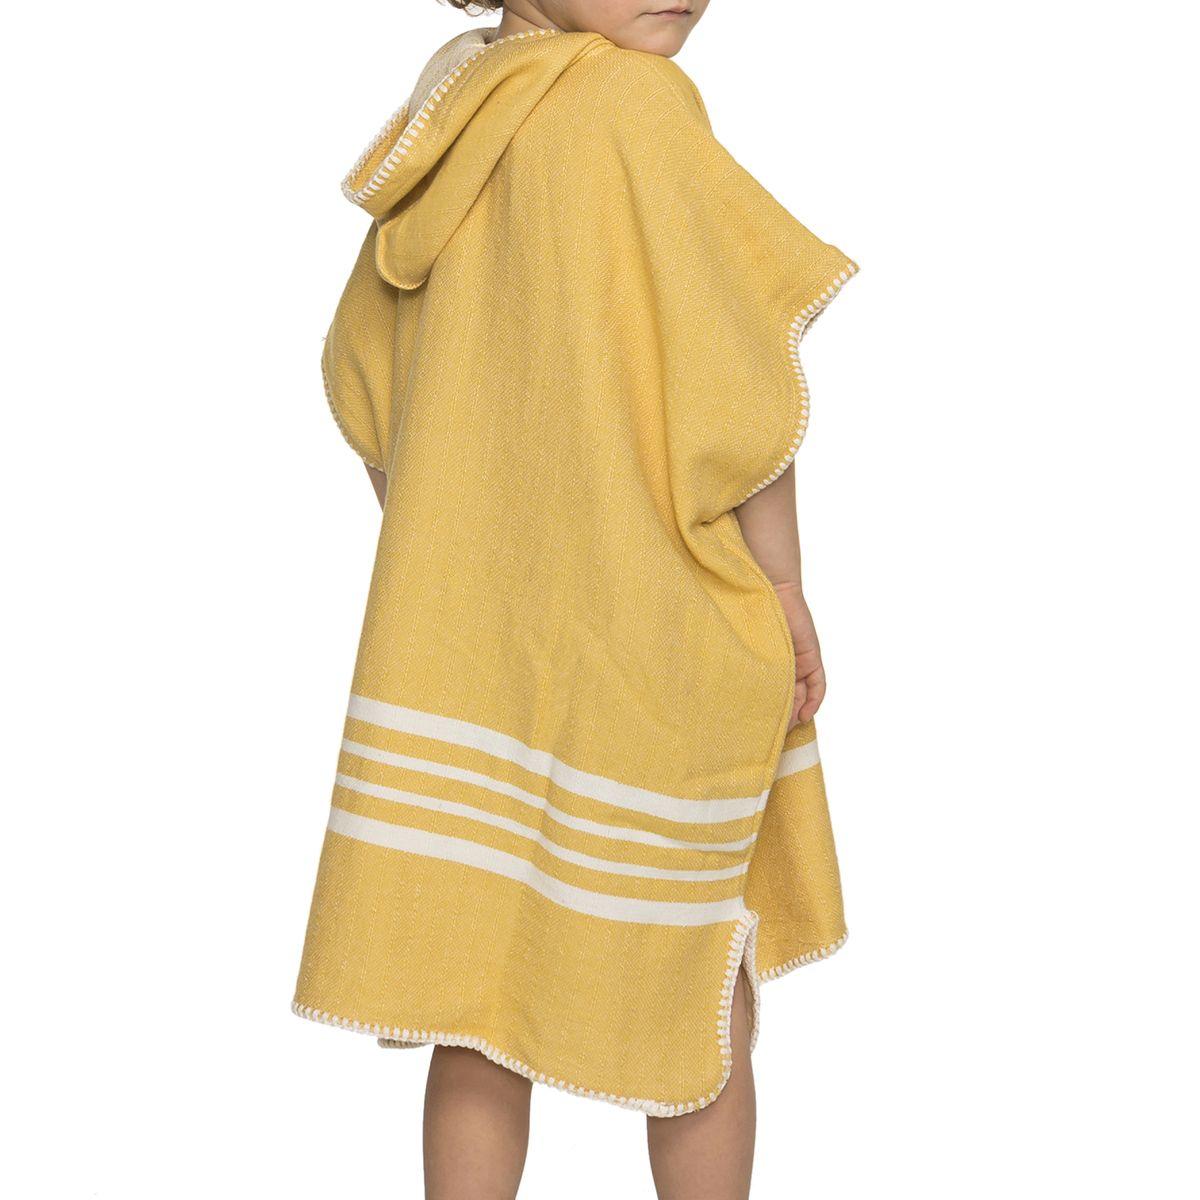 Poncho Kiddo / Sultan - Yellow